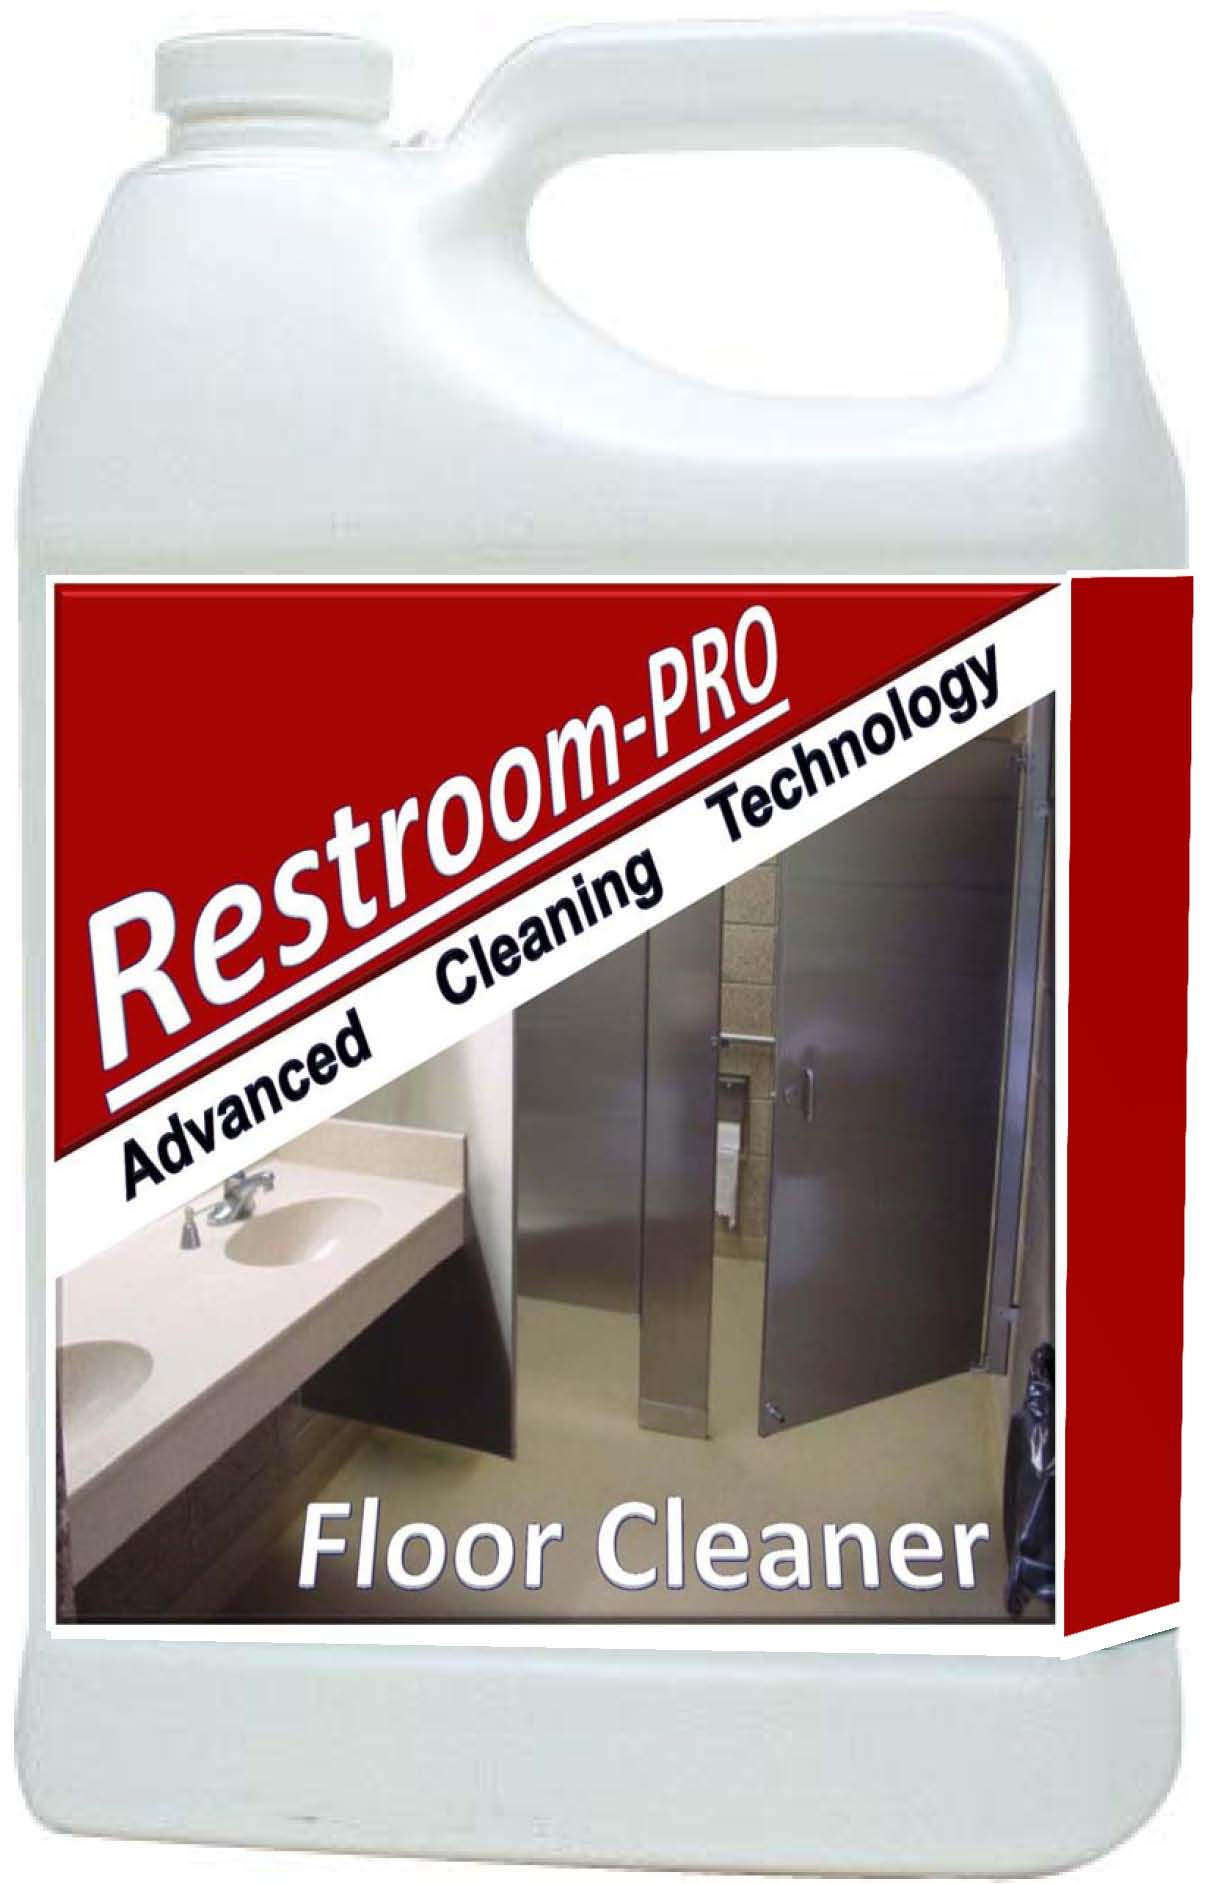 Restroom Pro Odor Eliminator (4) 1 gallon EZ Store Bottles